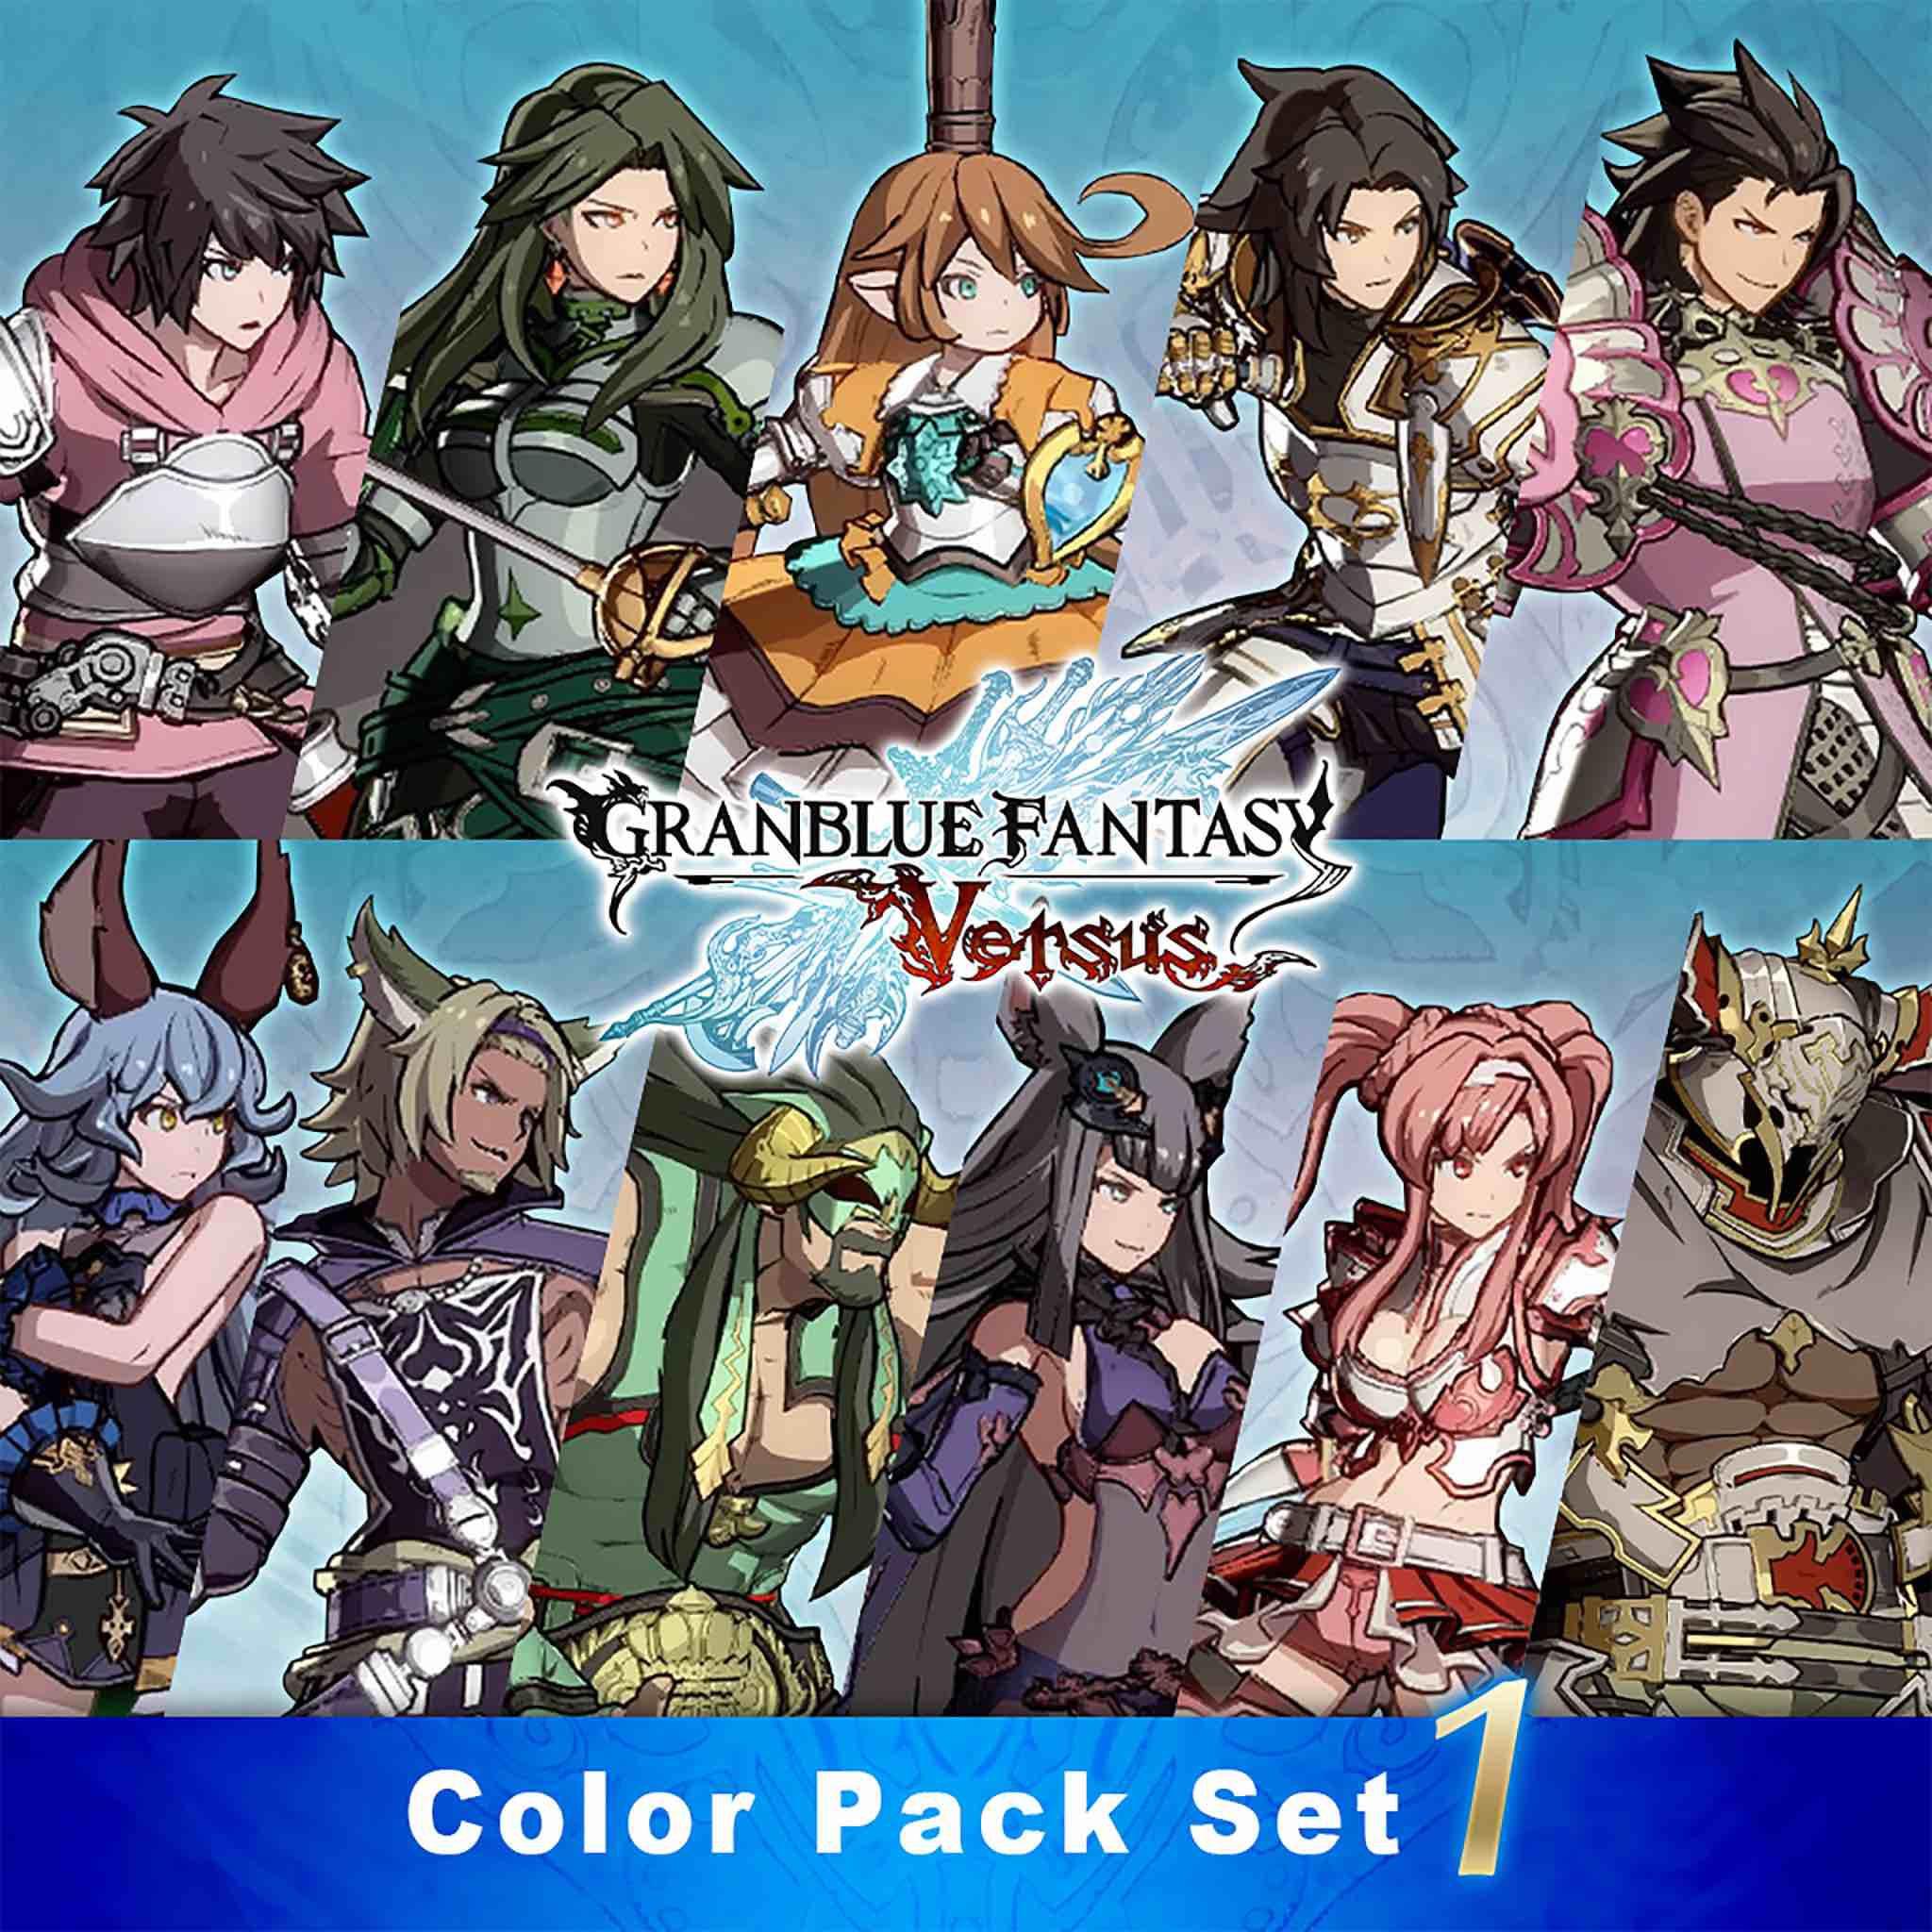 Granblue Fantasy: Versus - Color Pack 1